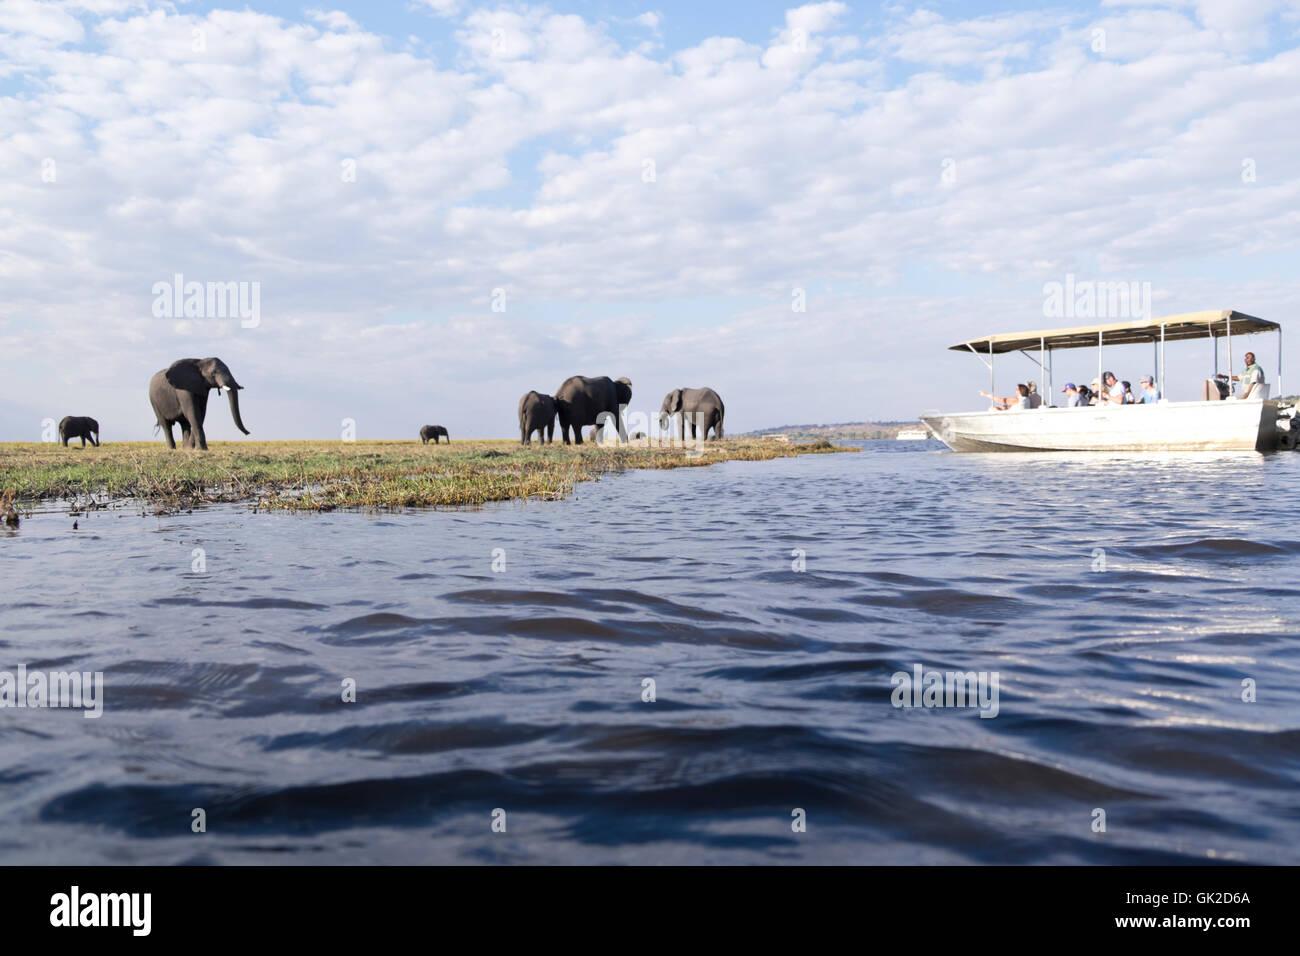 Tourists watch elephants  (loxodonta africana) grazing whilst game viewing on safari boats on the Chobe river Botswana - Stock Image